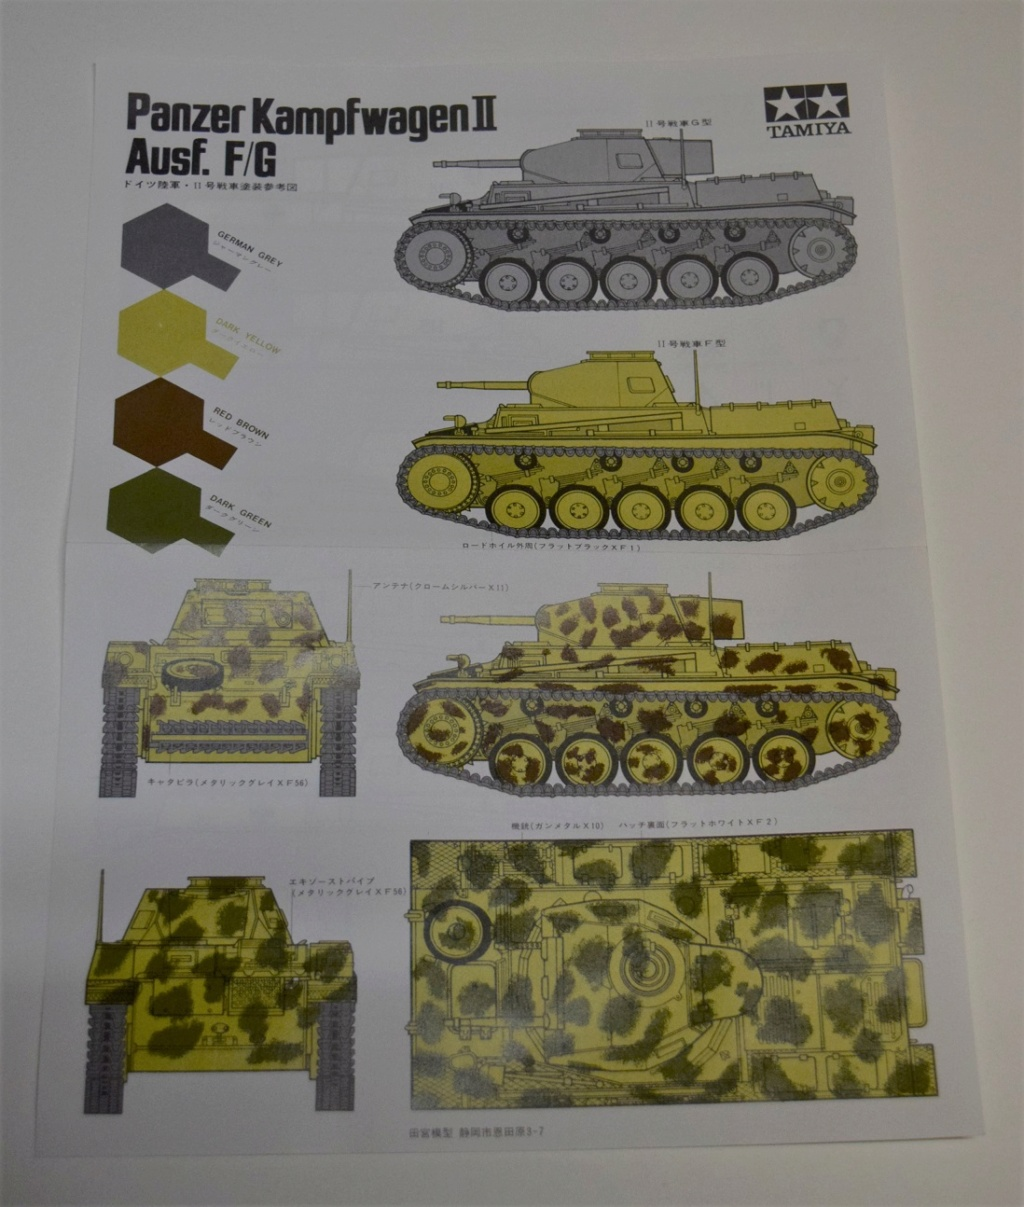 Fil rouge 2021 * Panzer Kampfwagen II Ausf. F/ G au 1/35 - TAMIYA - 1971 - *** Terminé en pg 3 Dsc_0324